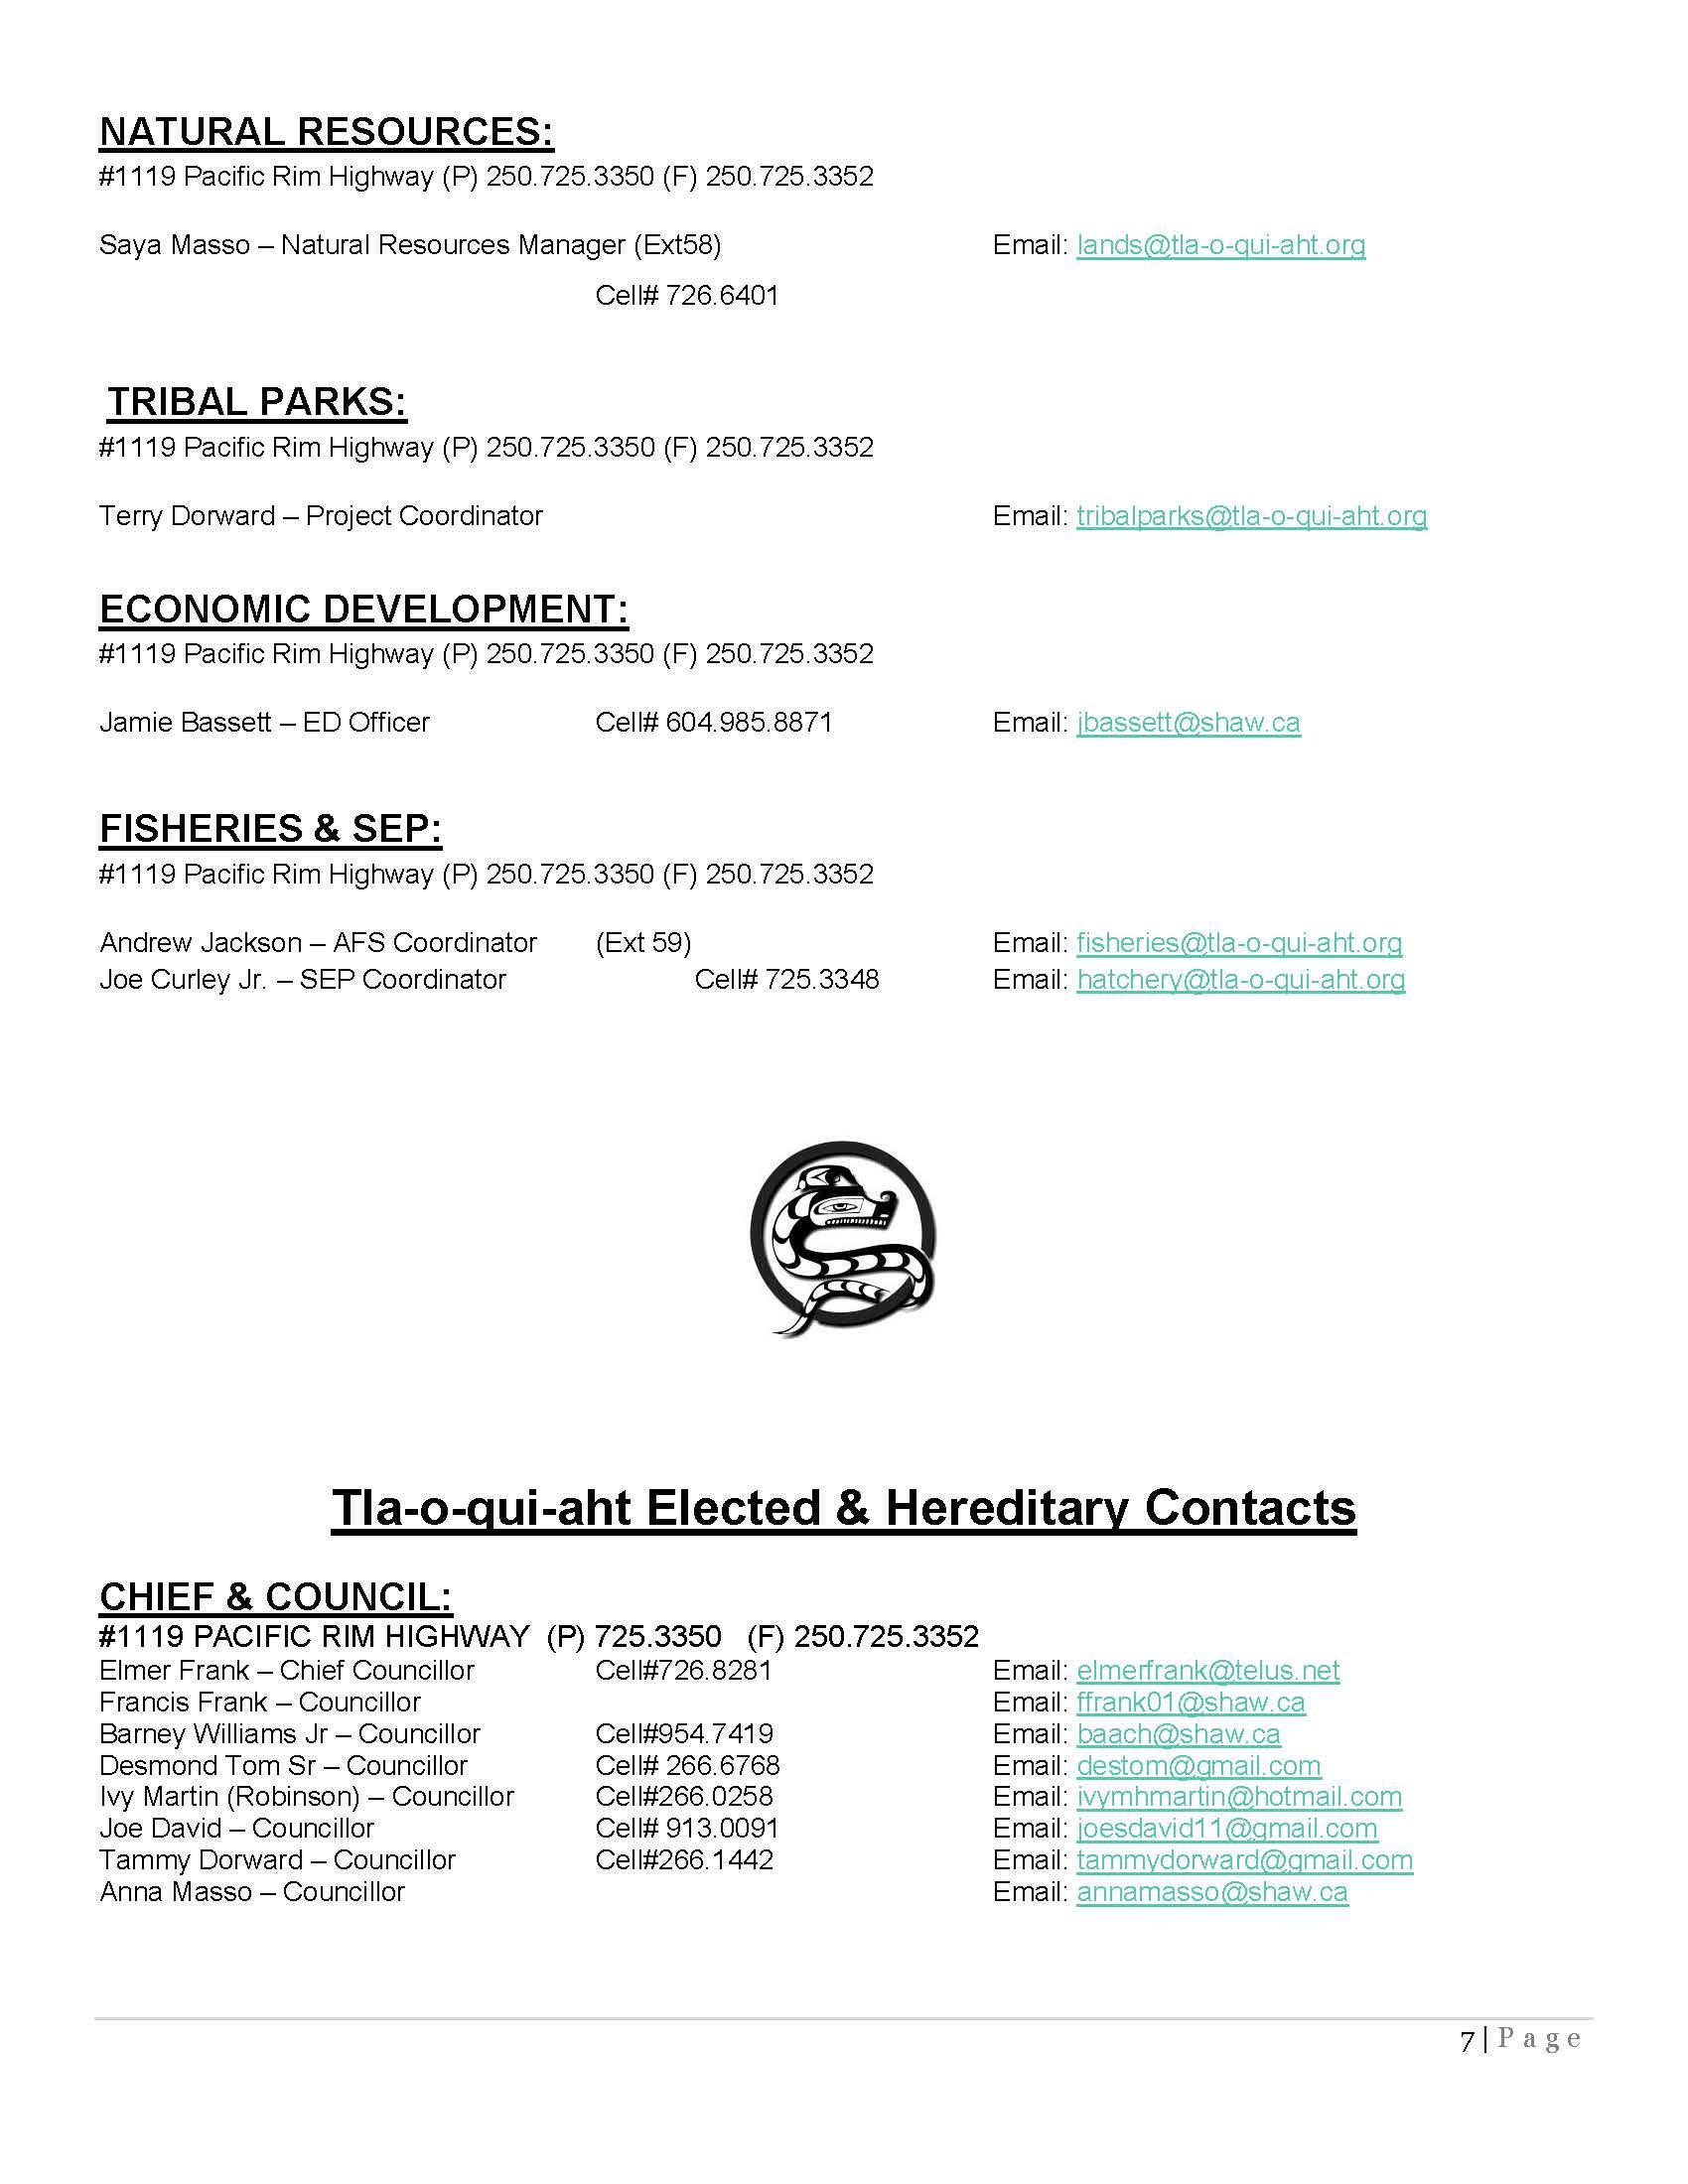 TFN Bulletin Dec 15-2016 - WEBSITE VERSION_Page_07.jpg